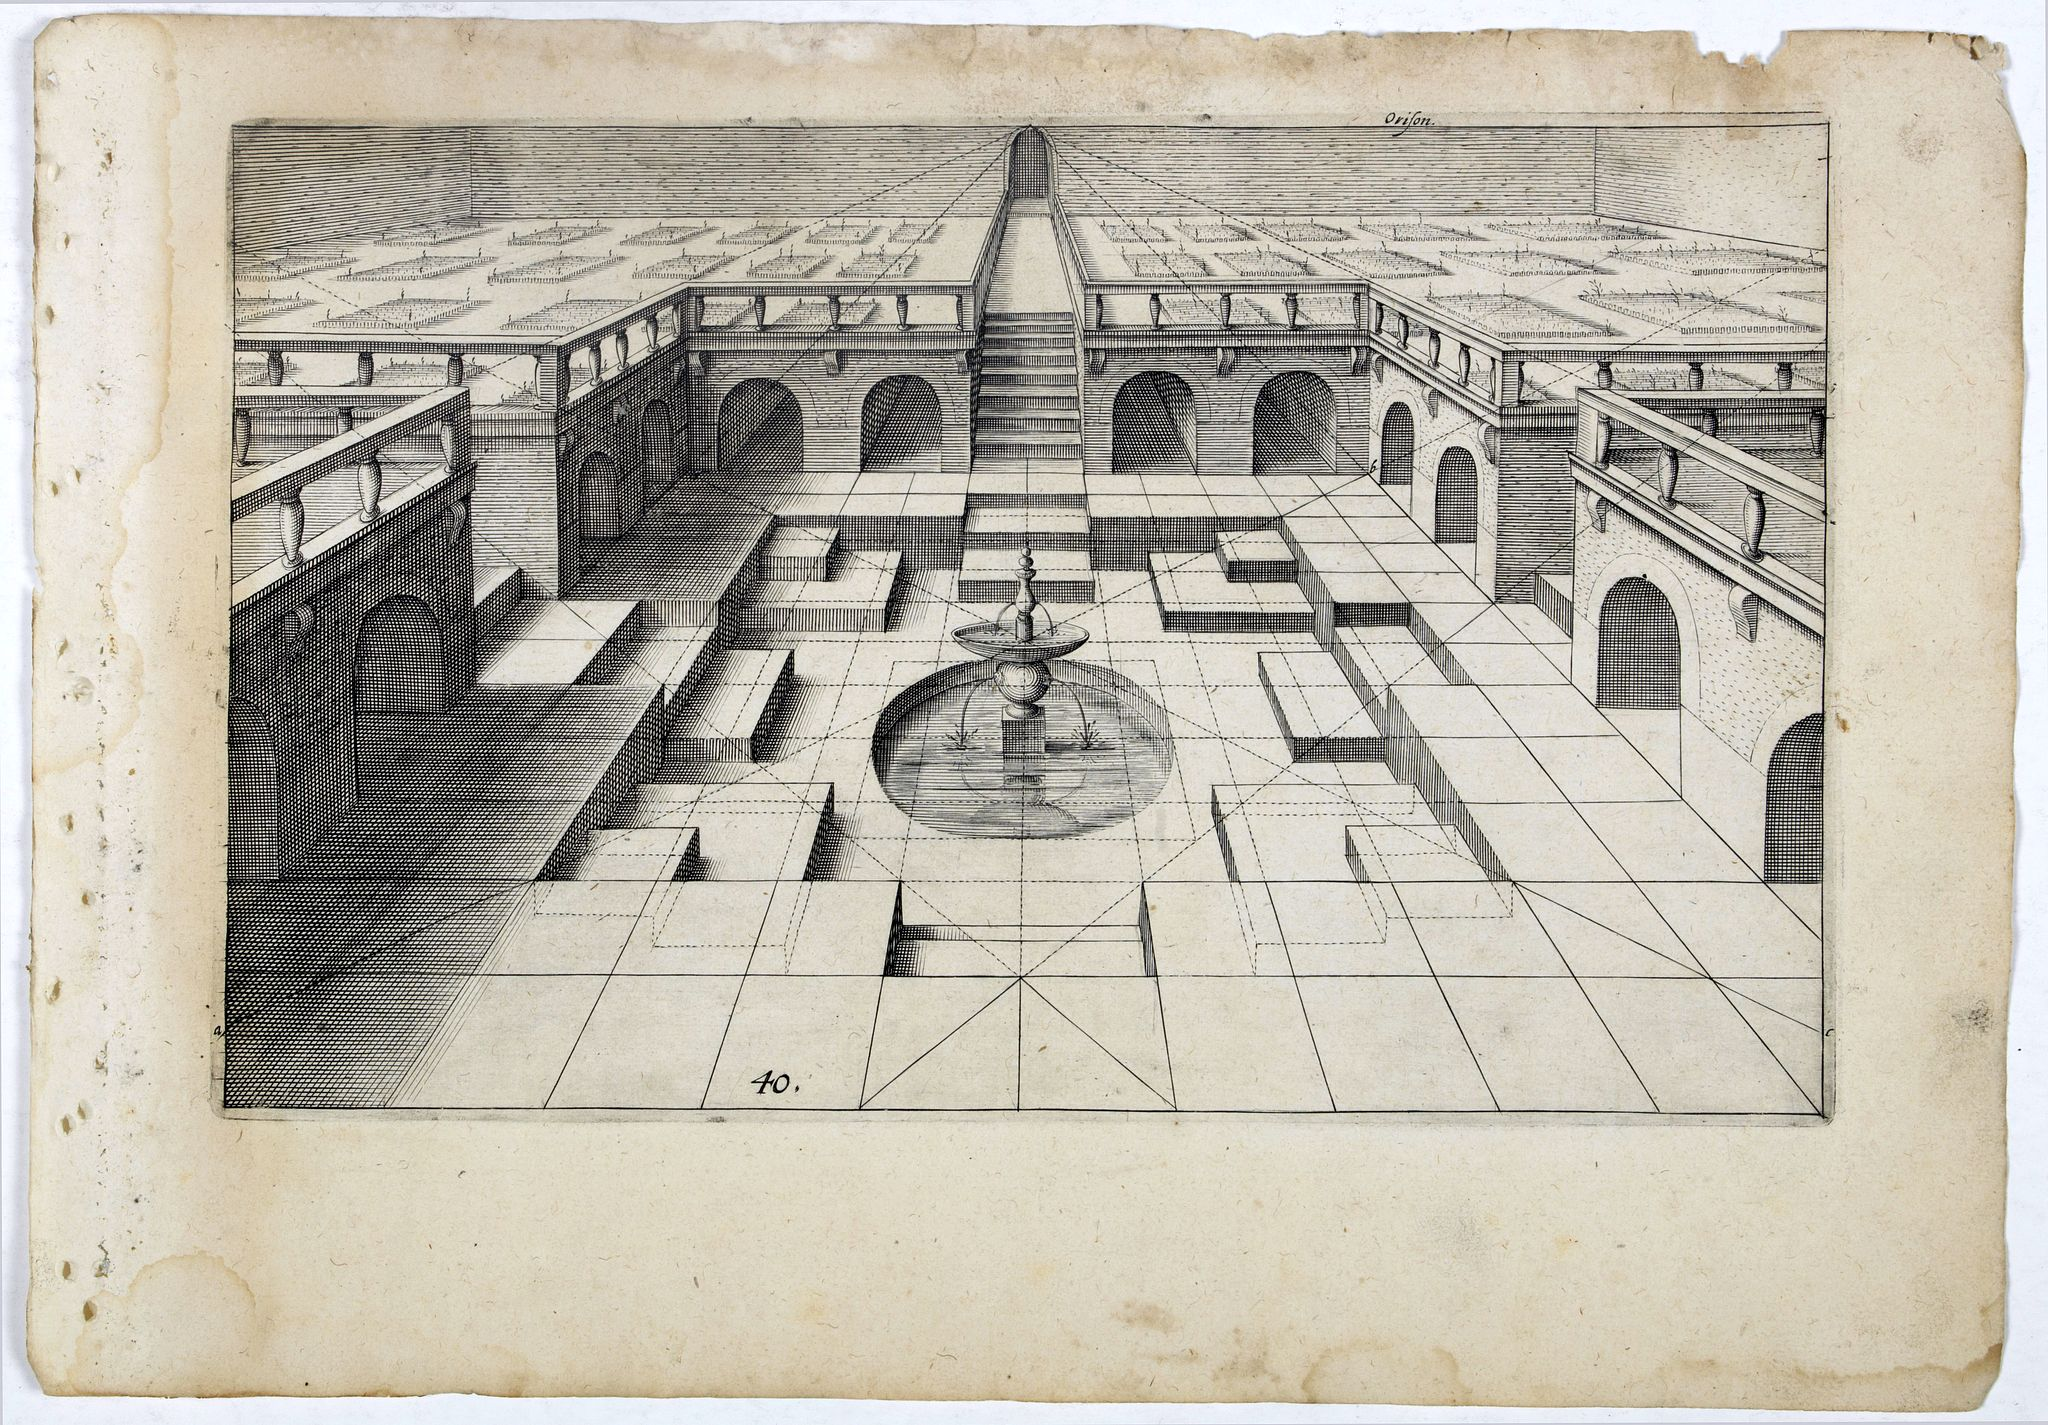 VREDEMAN DE VRIES, J. / HONDIUS, H. -  Perspective print by Vredeman de Vries. 40.